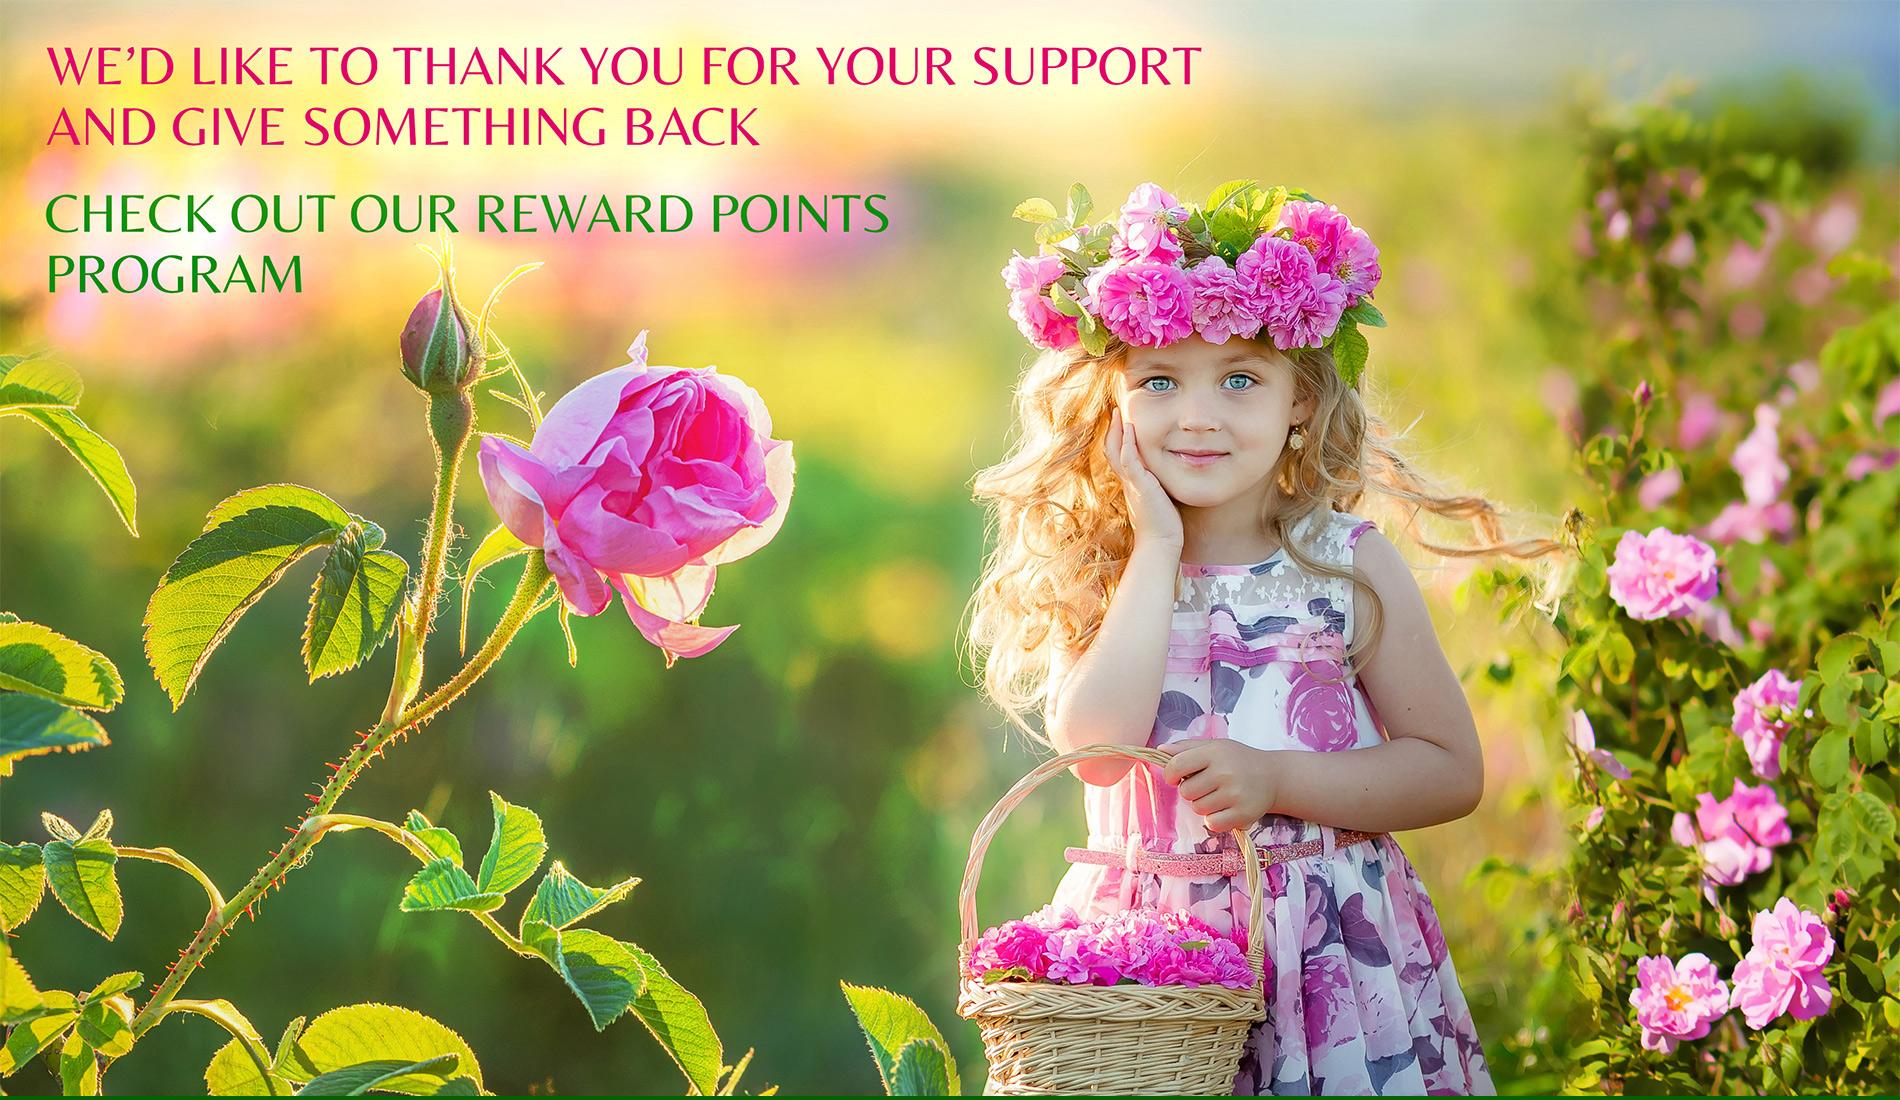 Reward Points Program